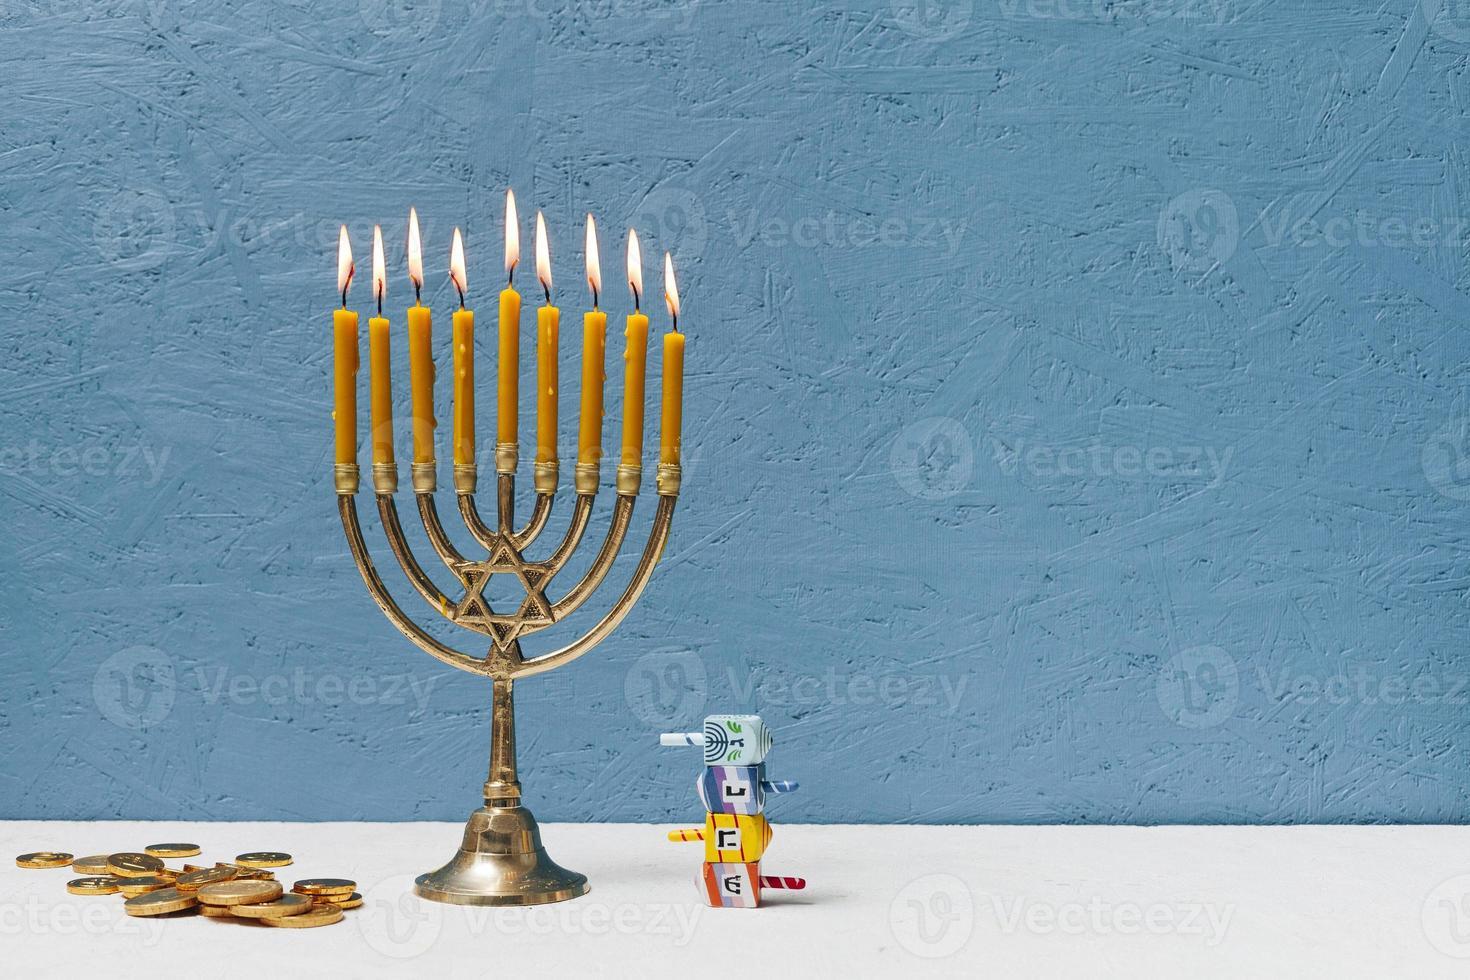 hebreisk ljusstakehållare som brinner på blå bakgrund foto